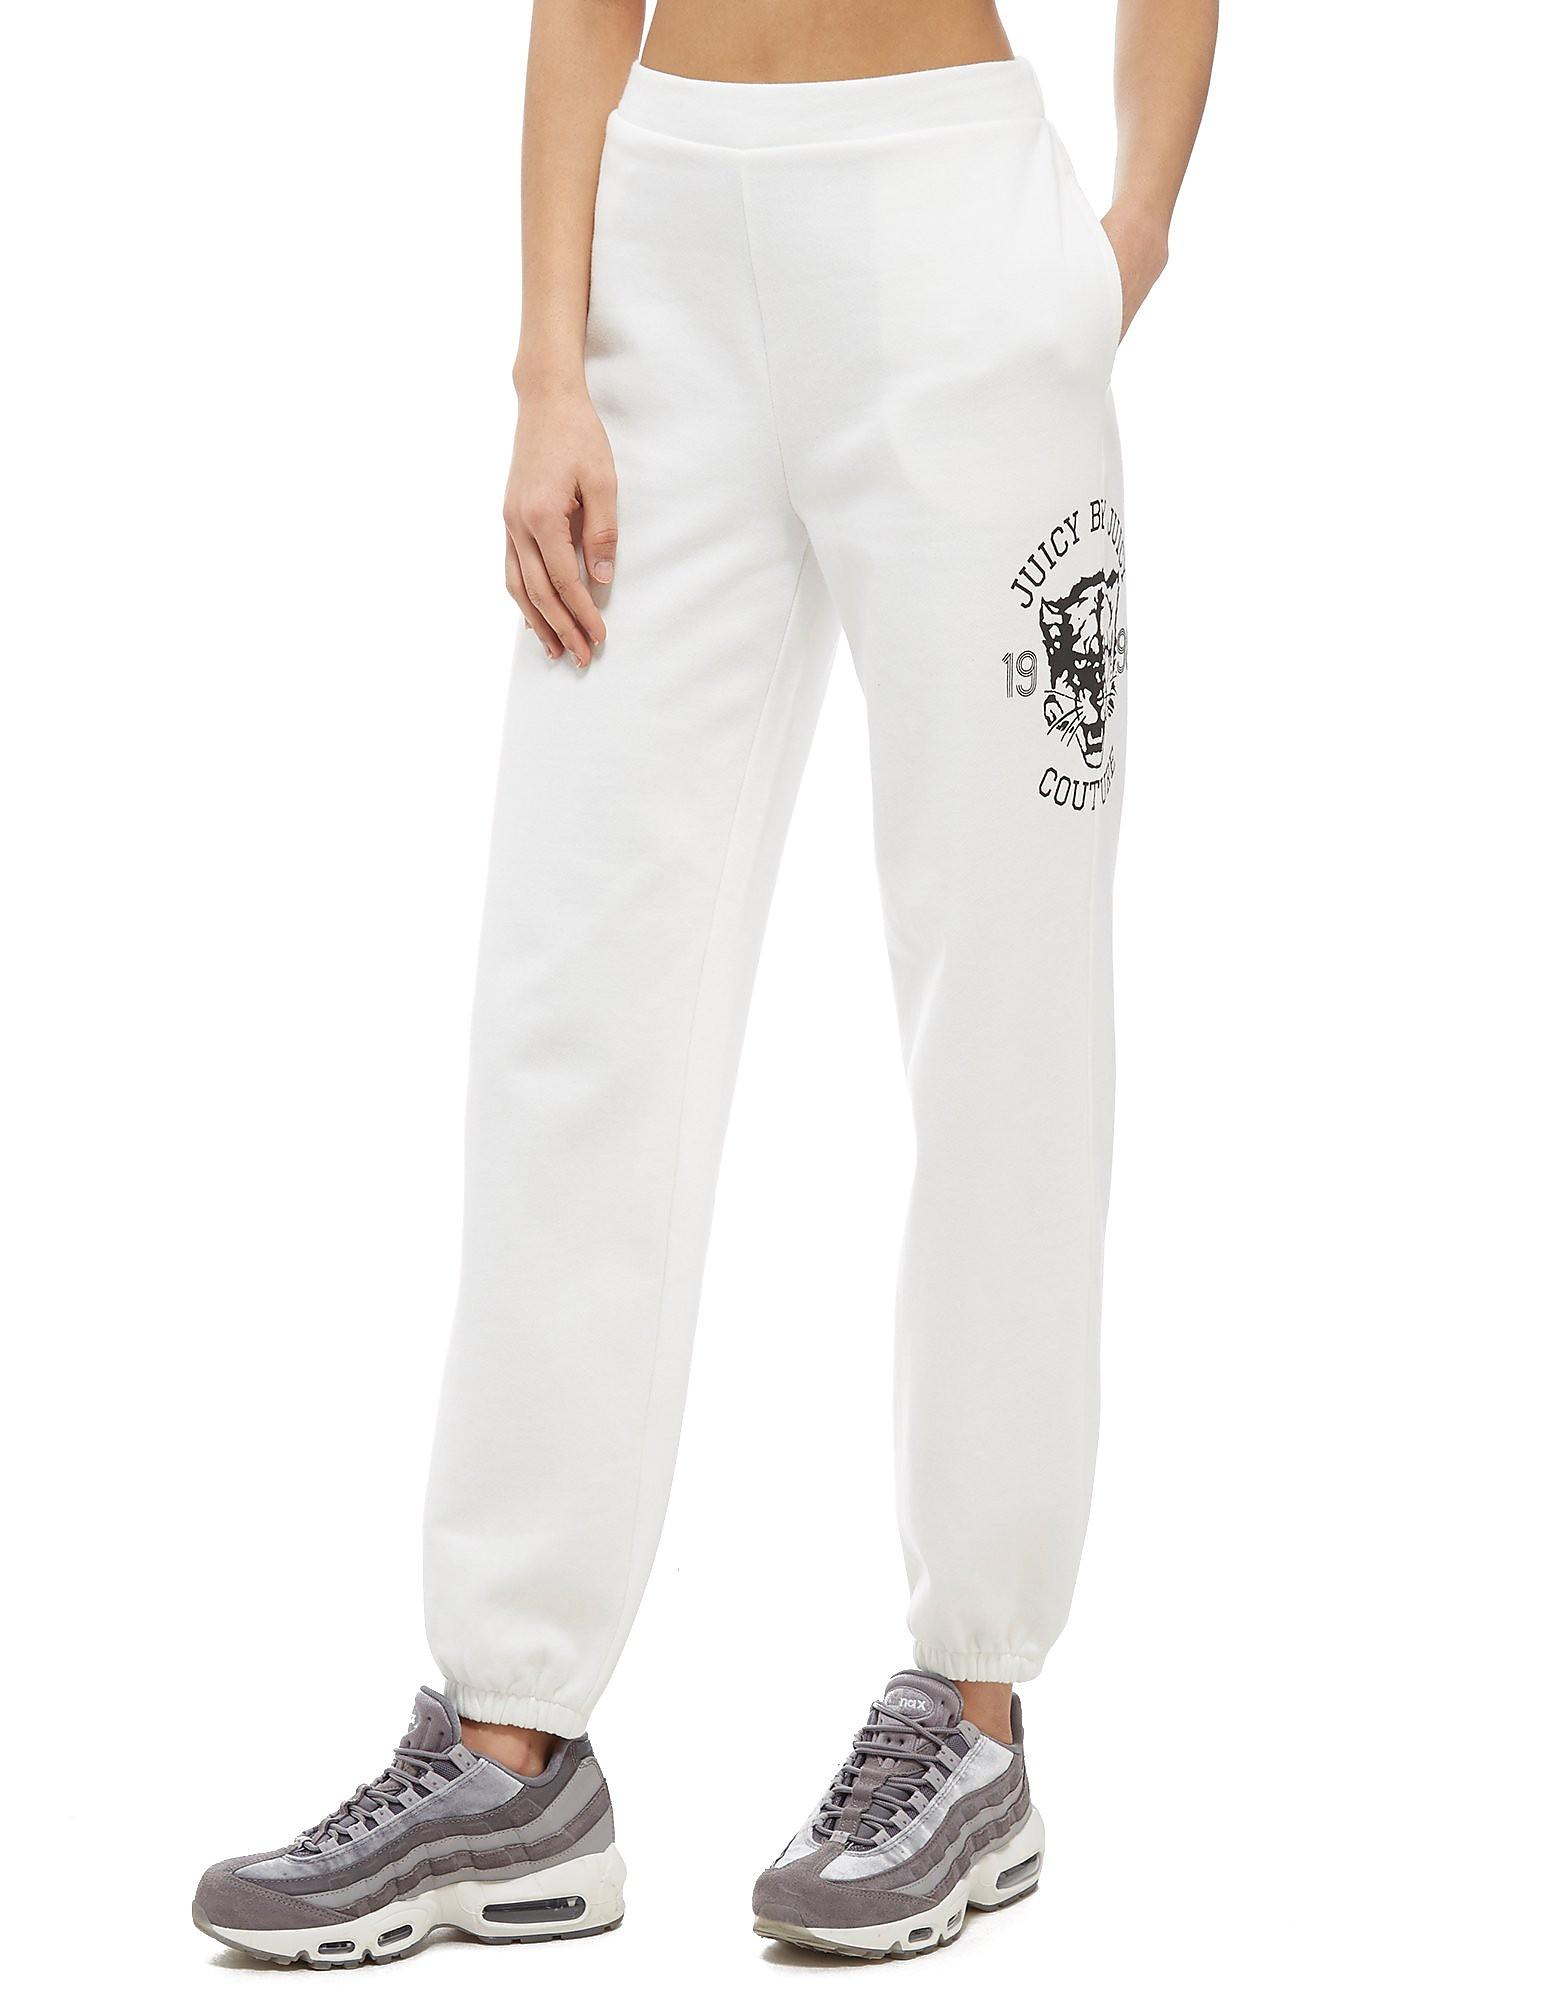 Juicy by Juicy Couture Logo Fleece Pants